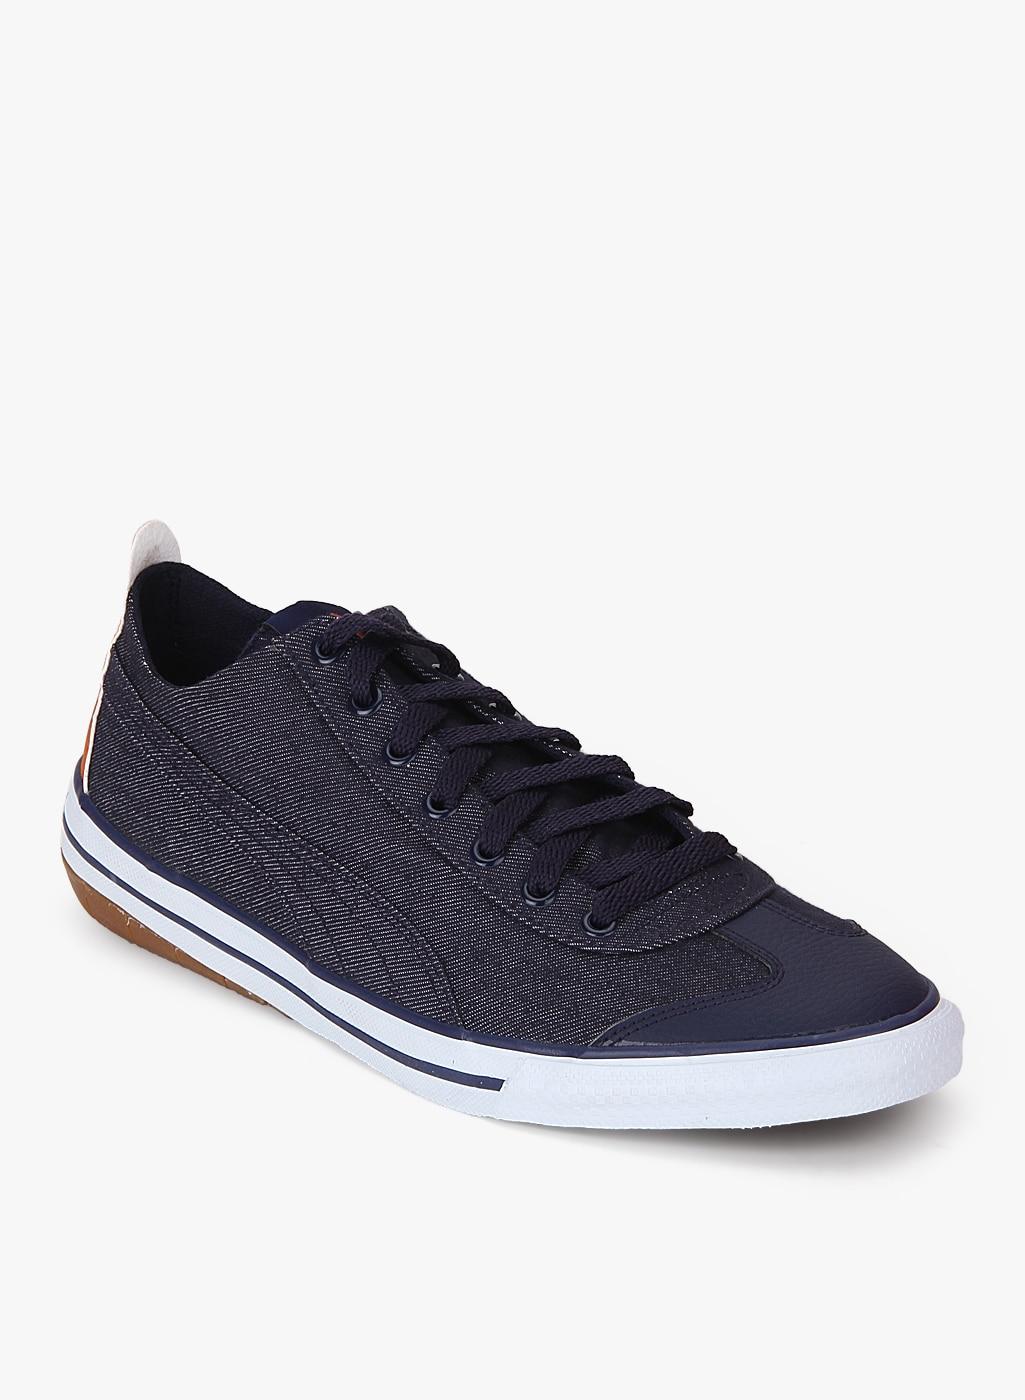 917 Fun Denim Idp Navy Blue Sneakers